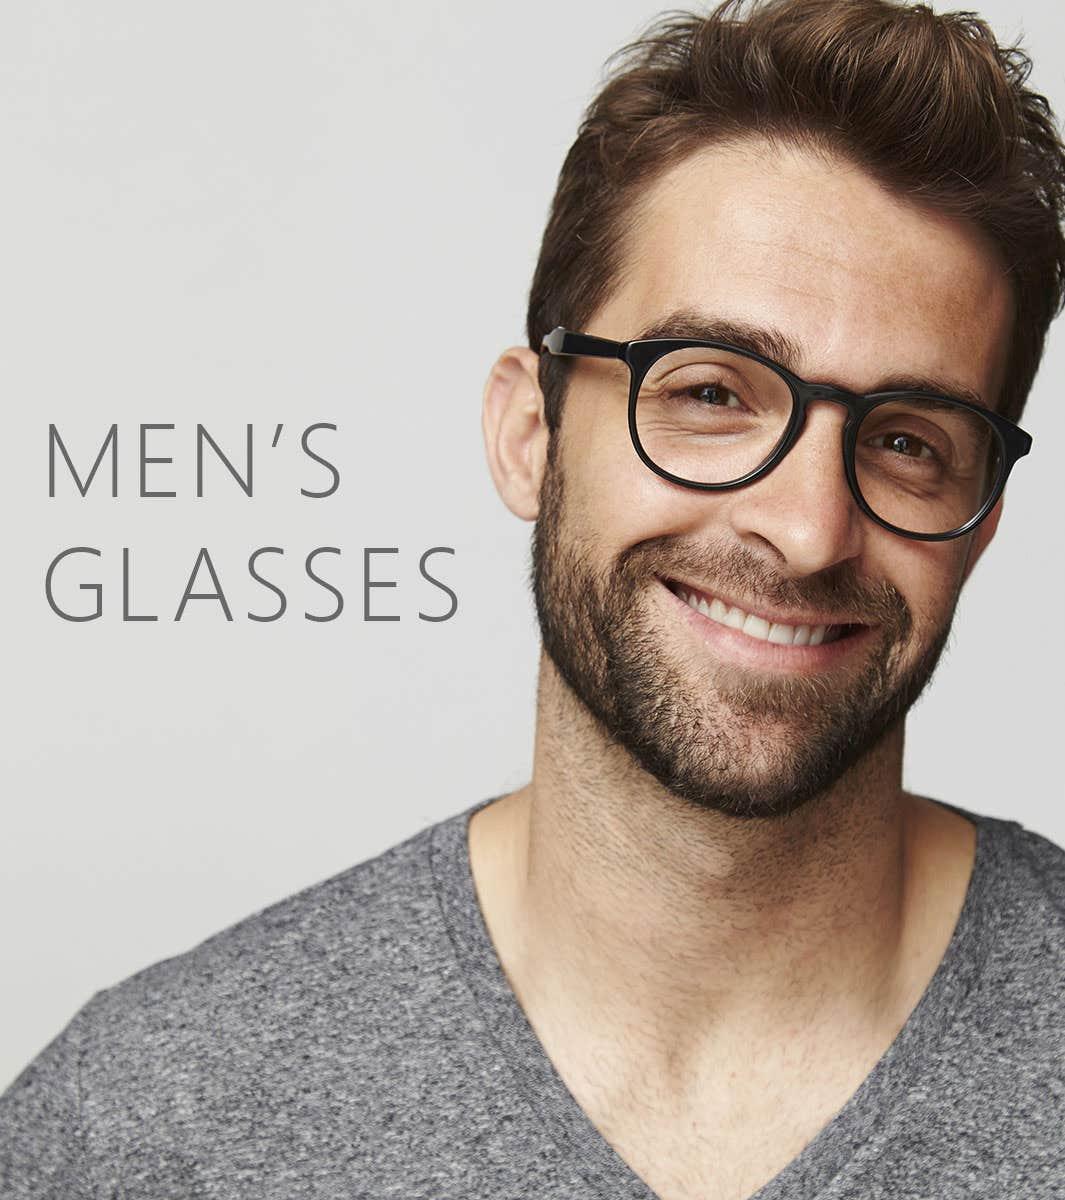 Goggles4u CA – Cheap Eyeglasses, Prescription Glasses Online